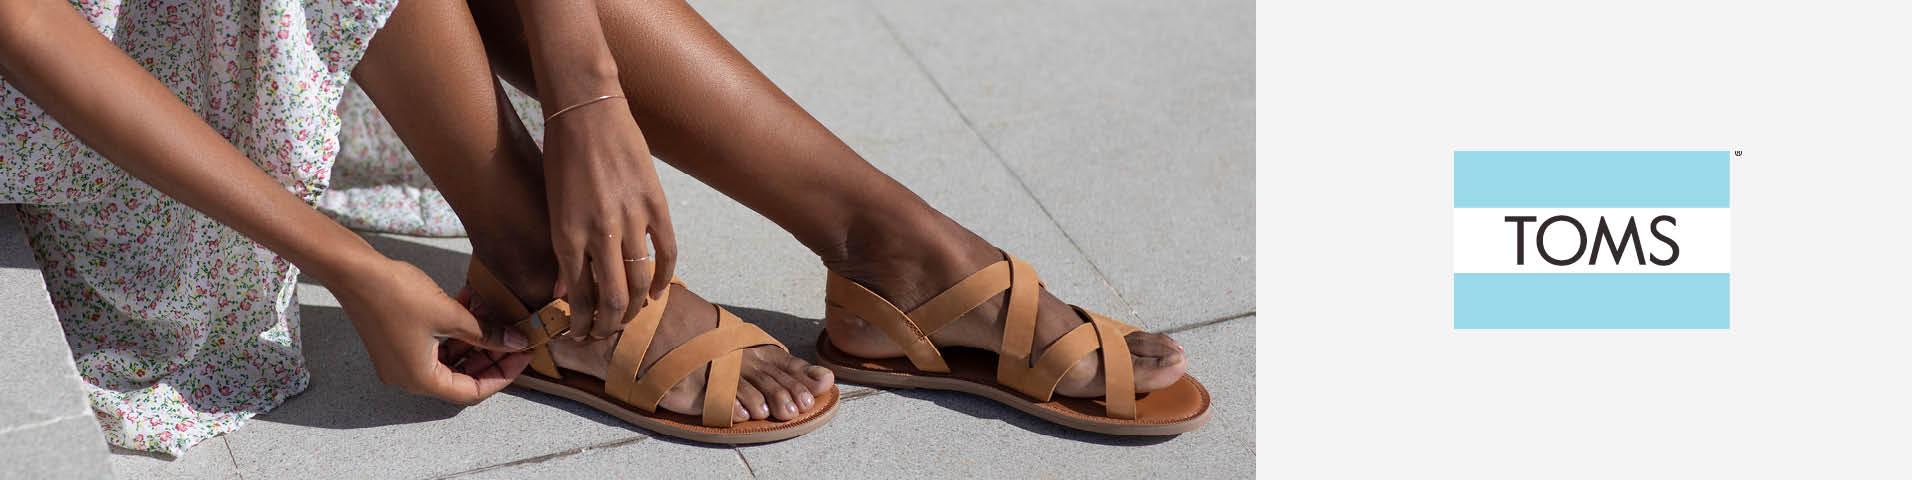 low priced 3e7b7 af54f Scarpe TOMS | Grande assortimento di calzature su Zalando